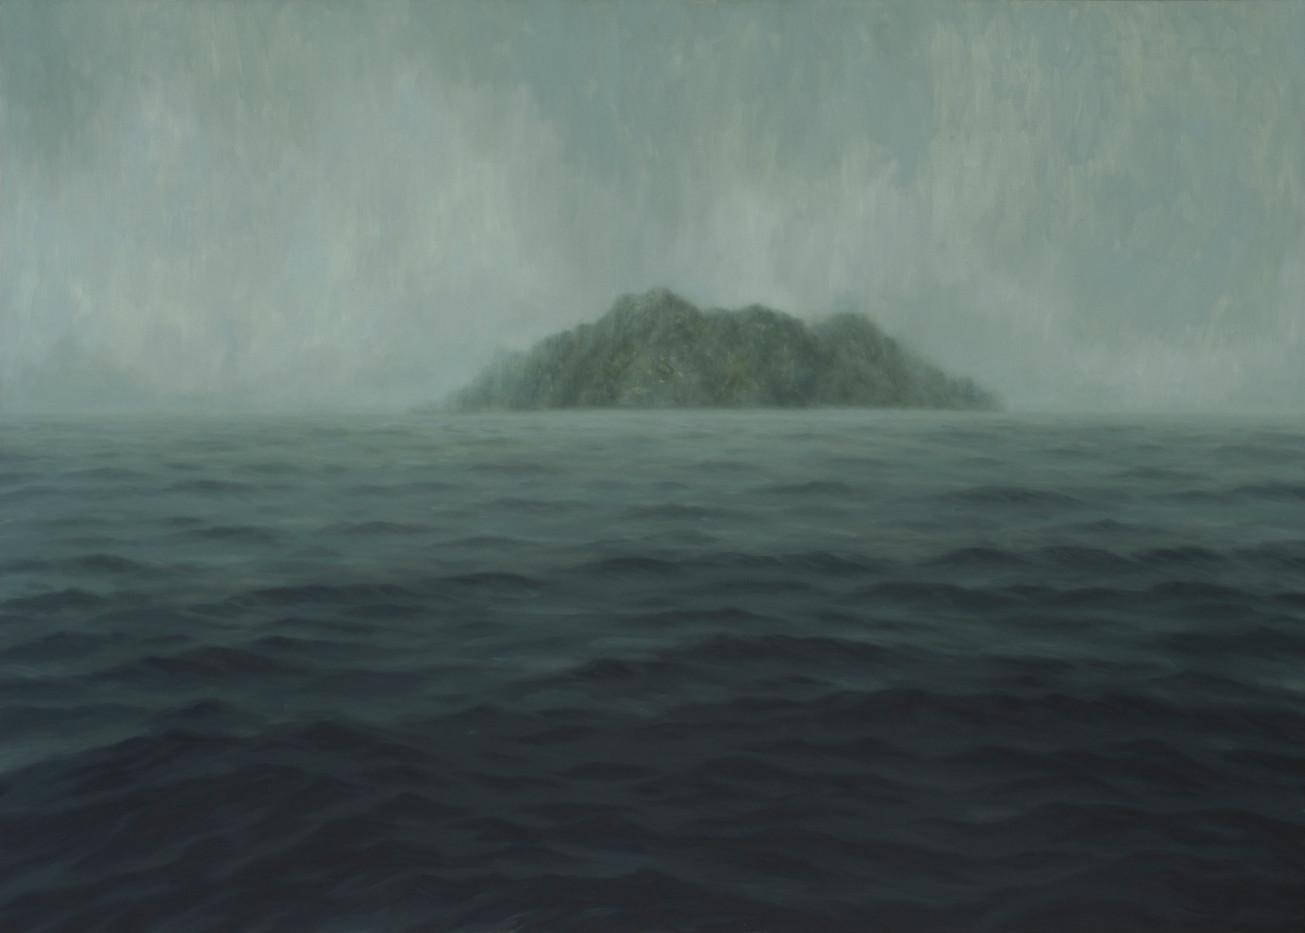 Jake Aikman | The Island | 2014 | Oil on Canvas | 150 x 210 cm